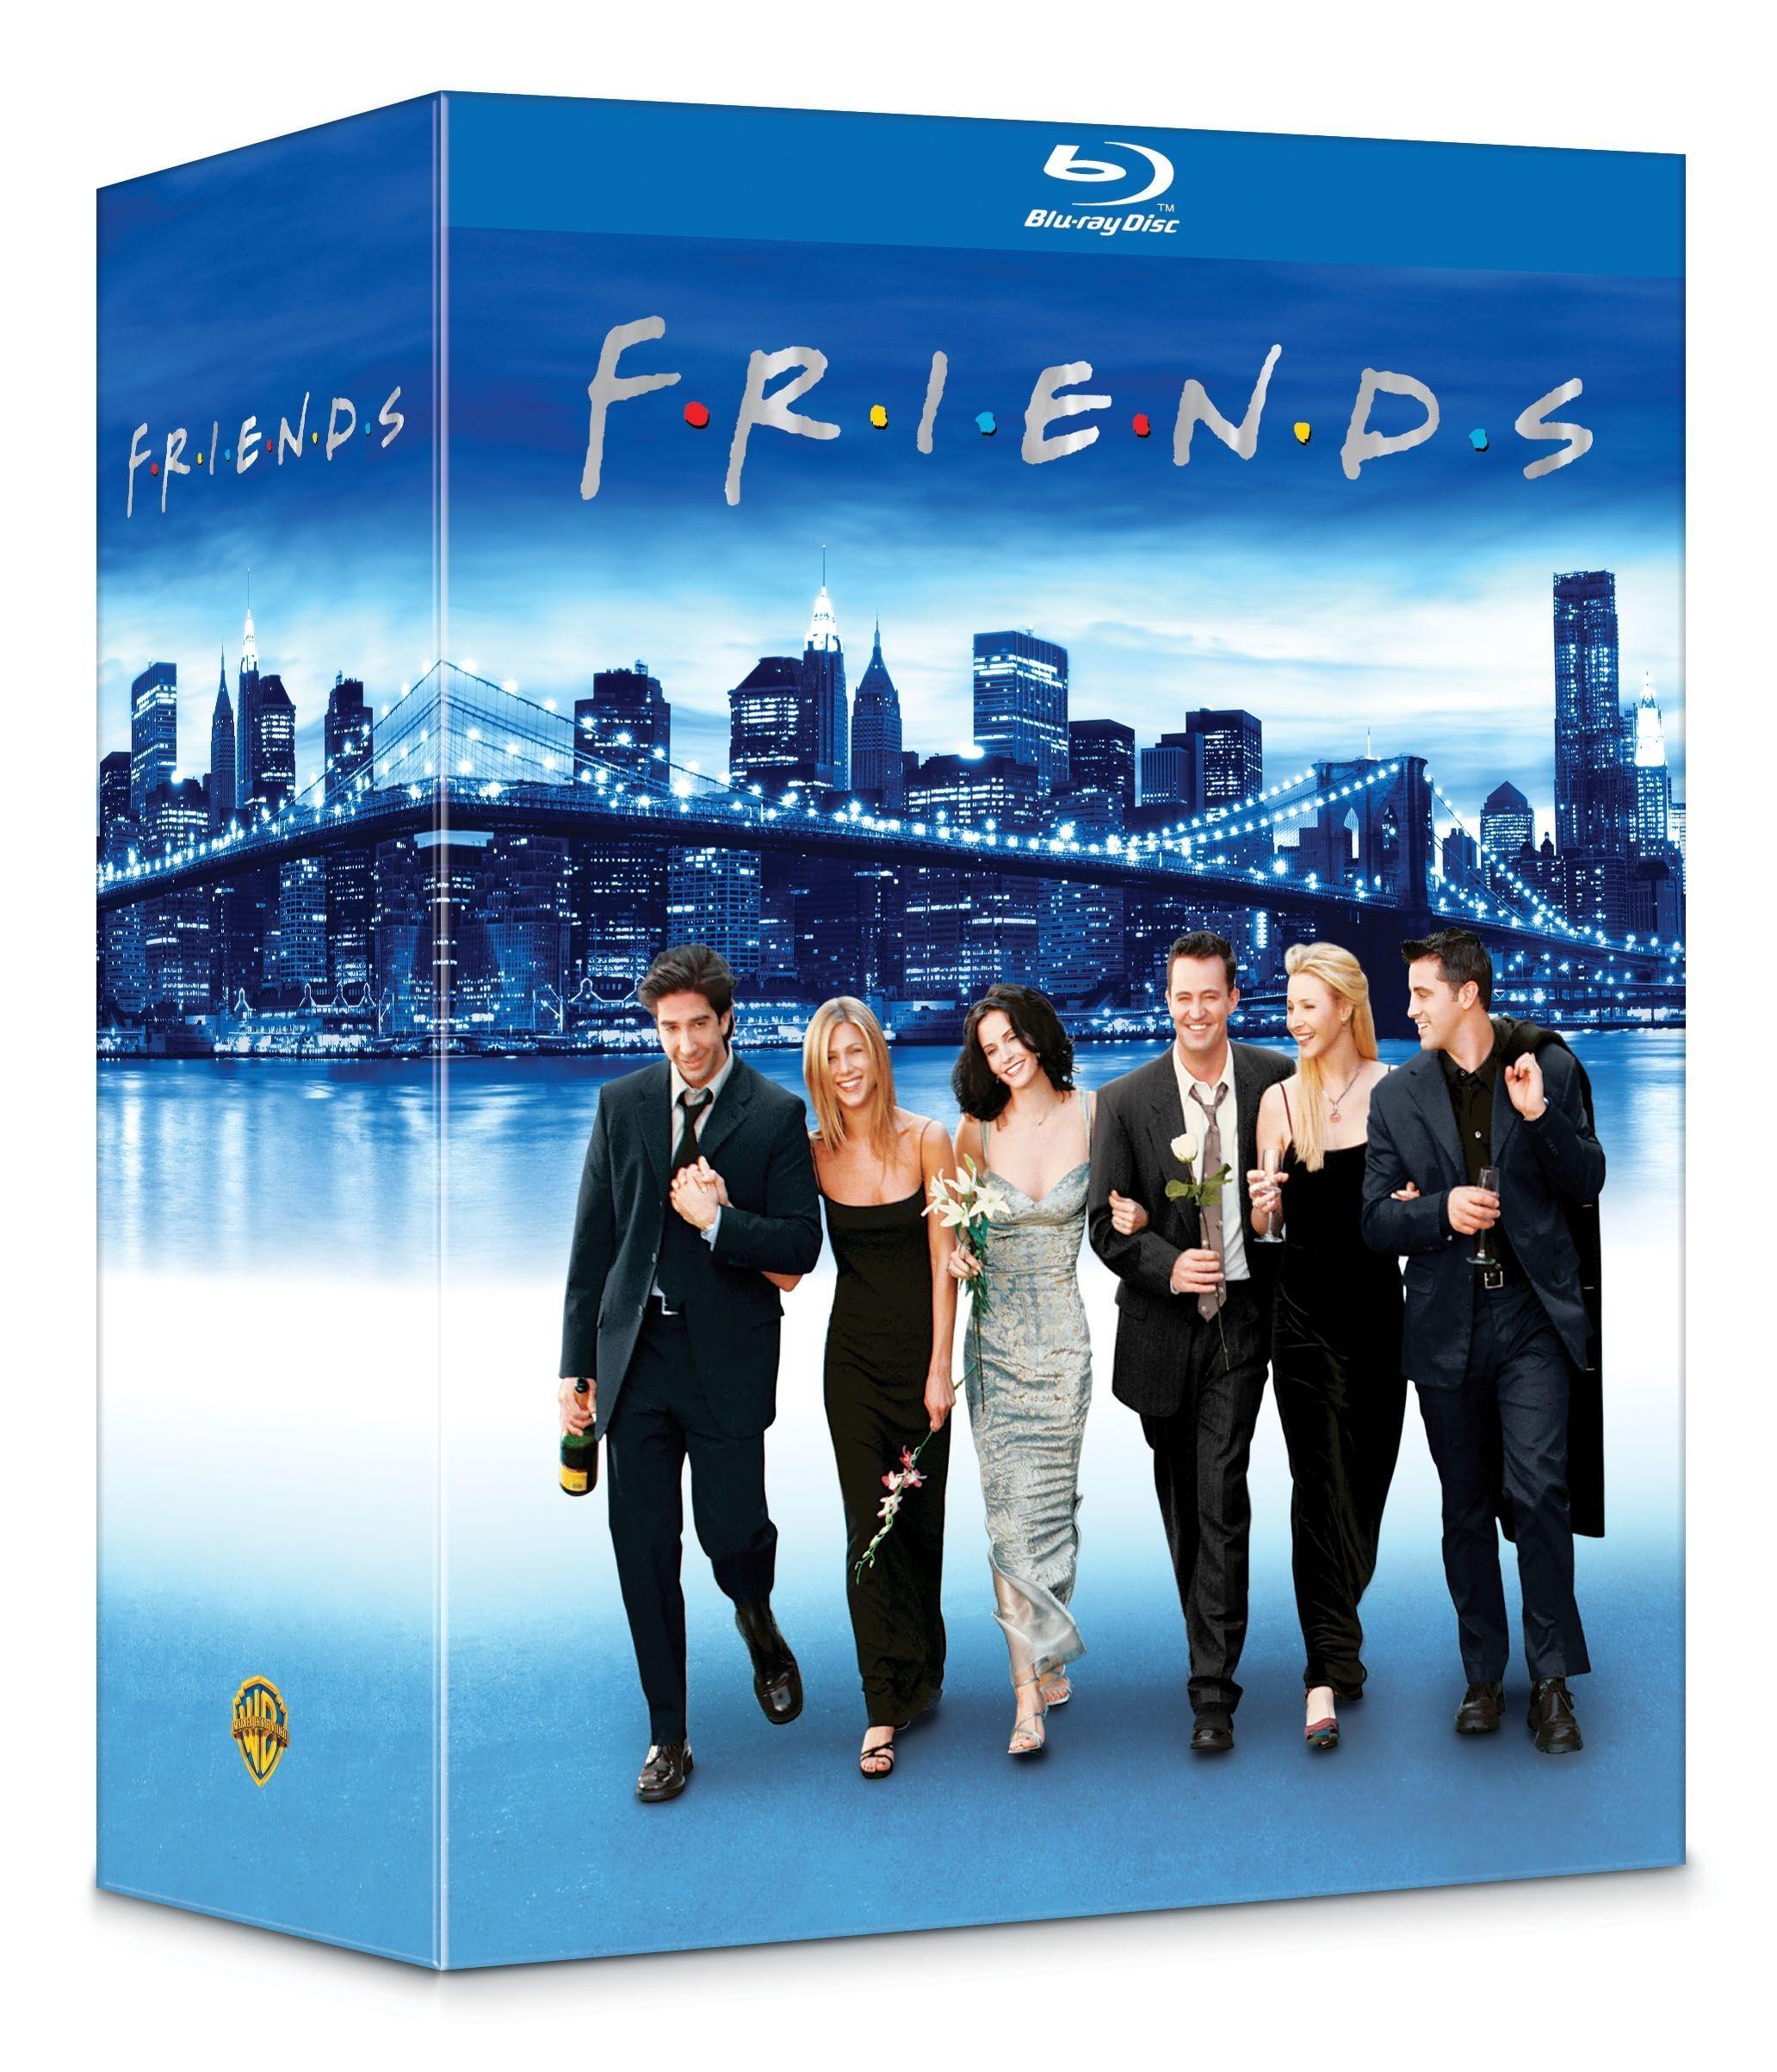 Coffret Blu-ray Friends l'intégrale saisons 1-10